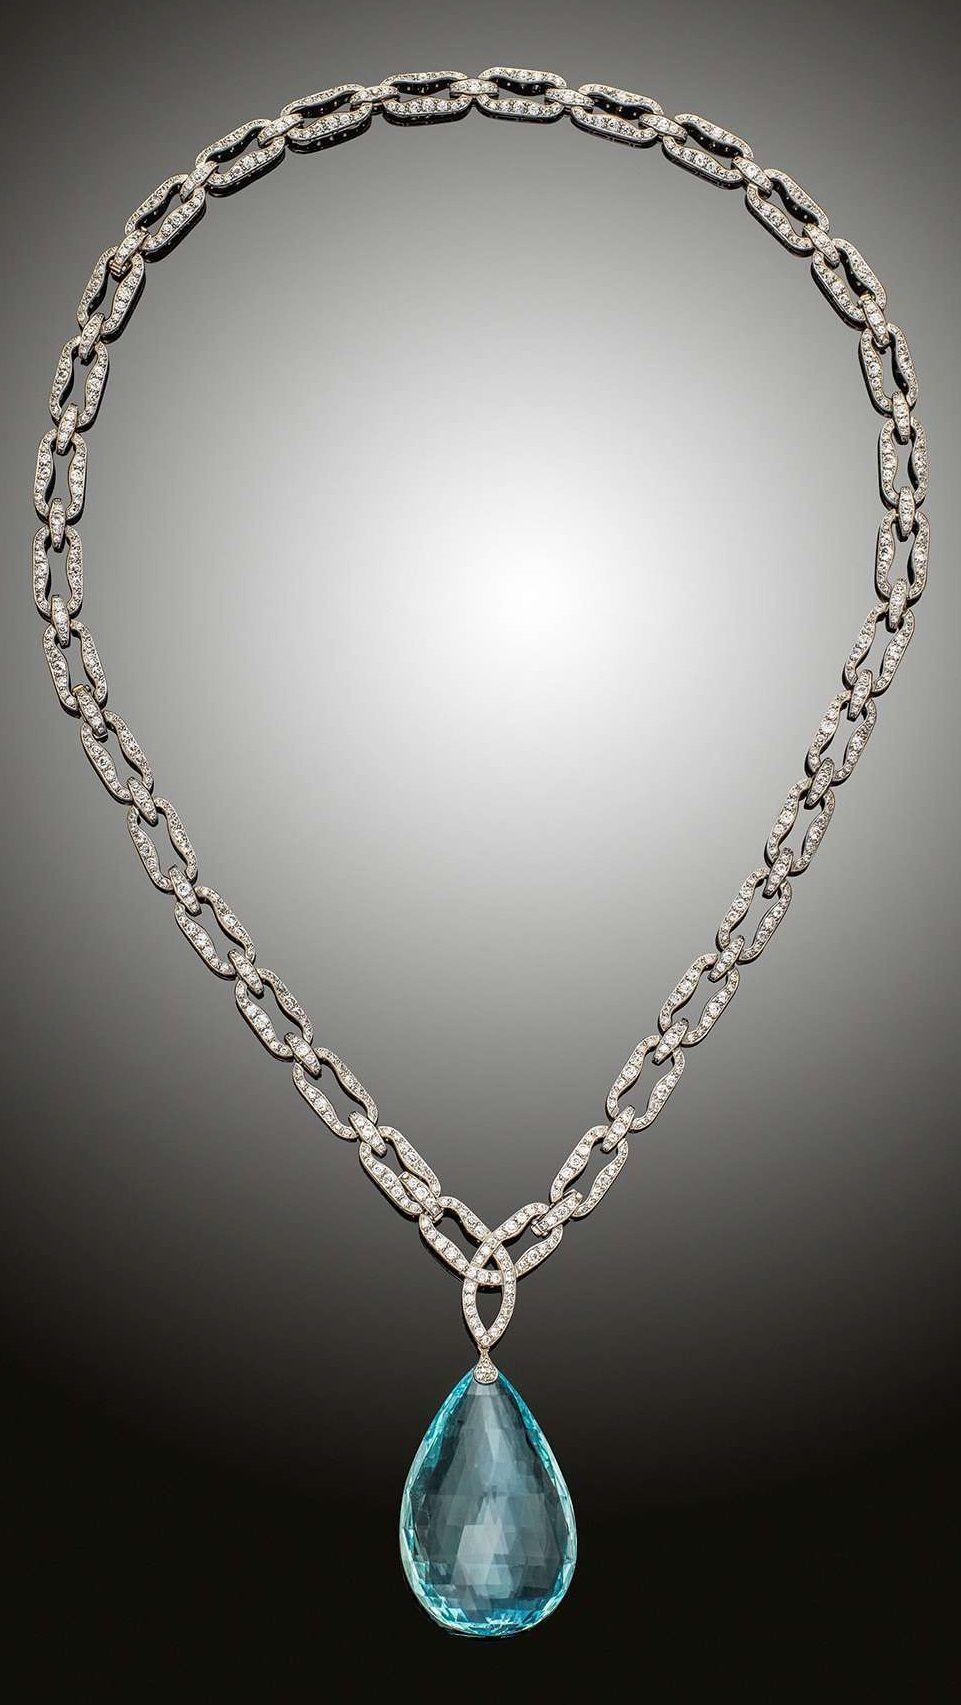 An edwardian aquamarine and diamond pendant necklace english circa an edwardian aquamarine and diamond pendant necklace english circa 1910 a large aquamarine aloadofball Image collections